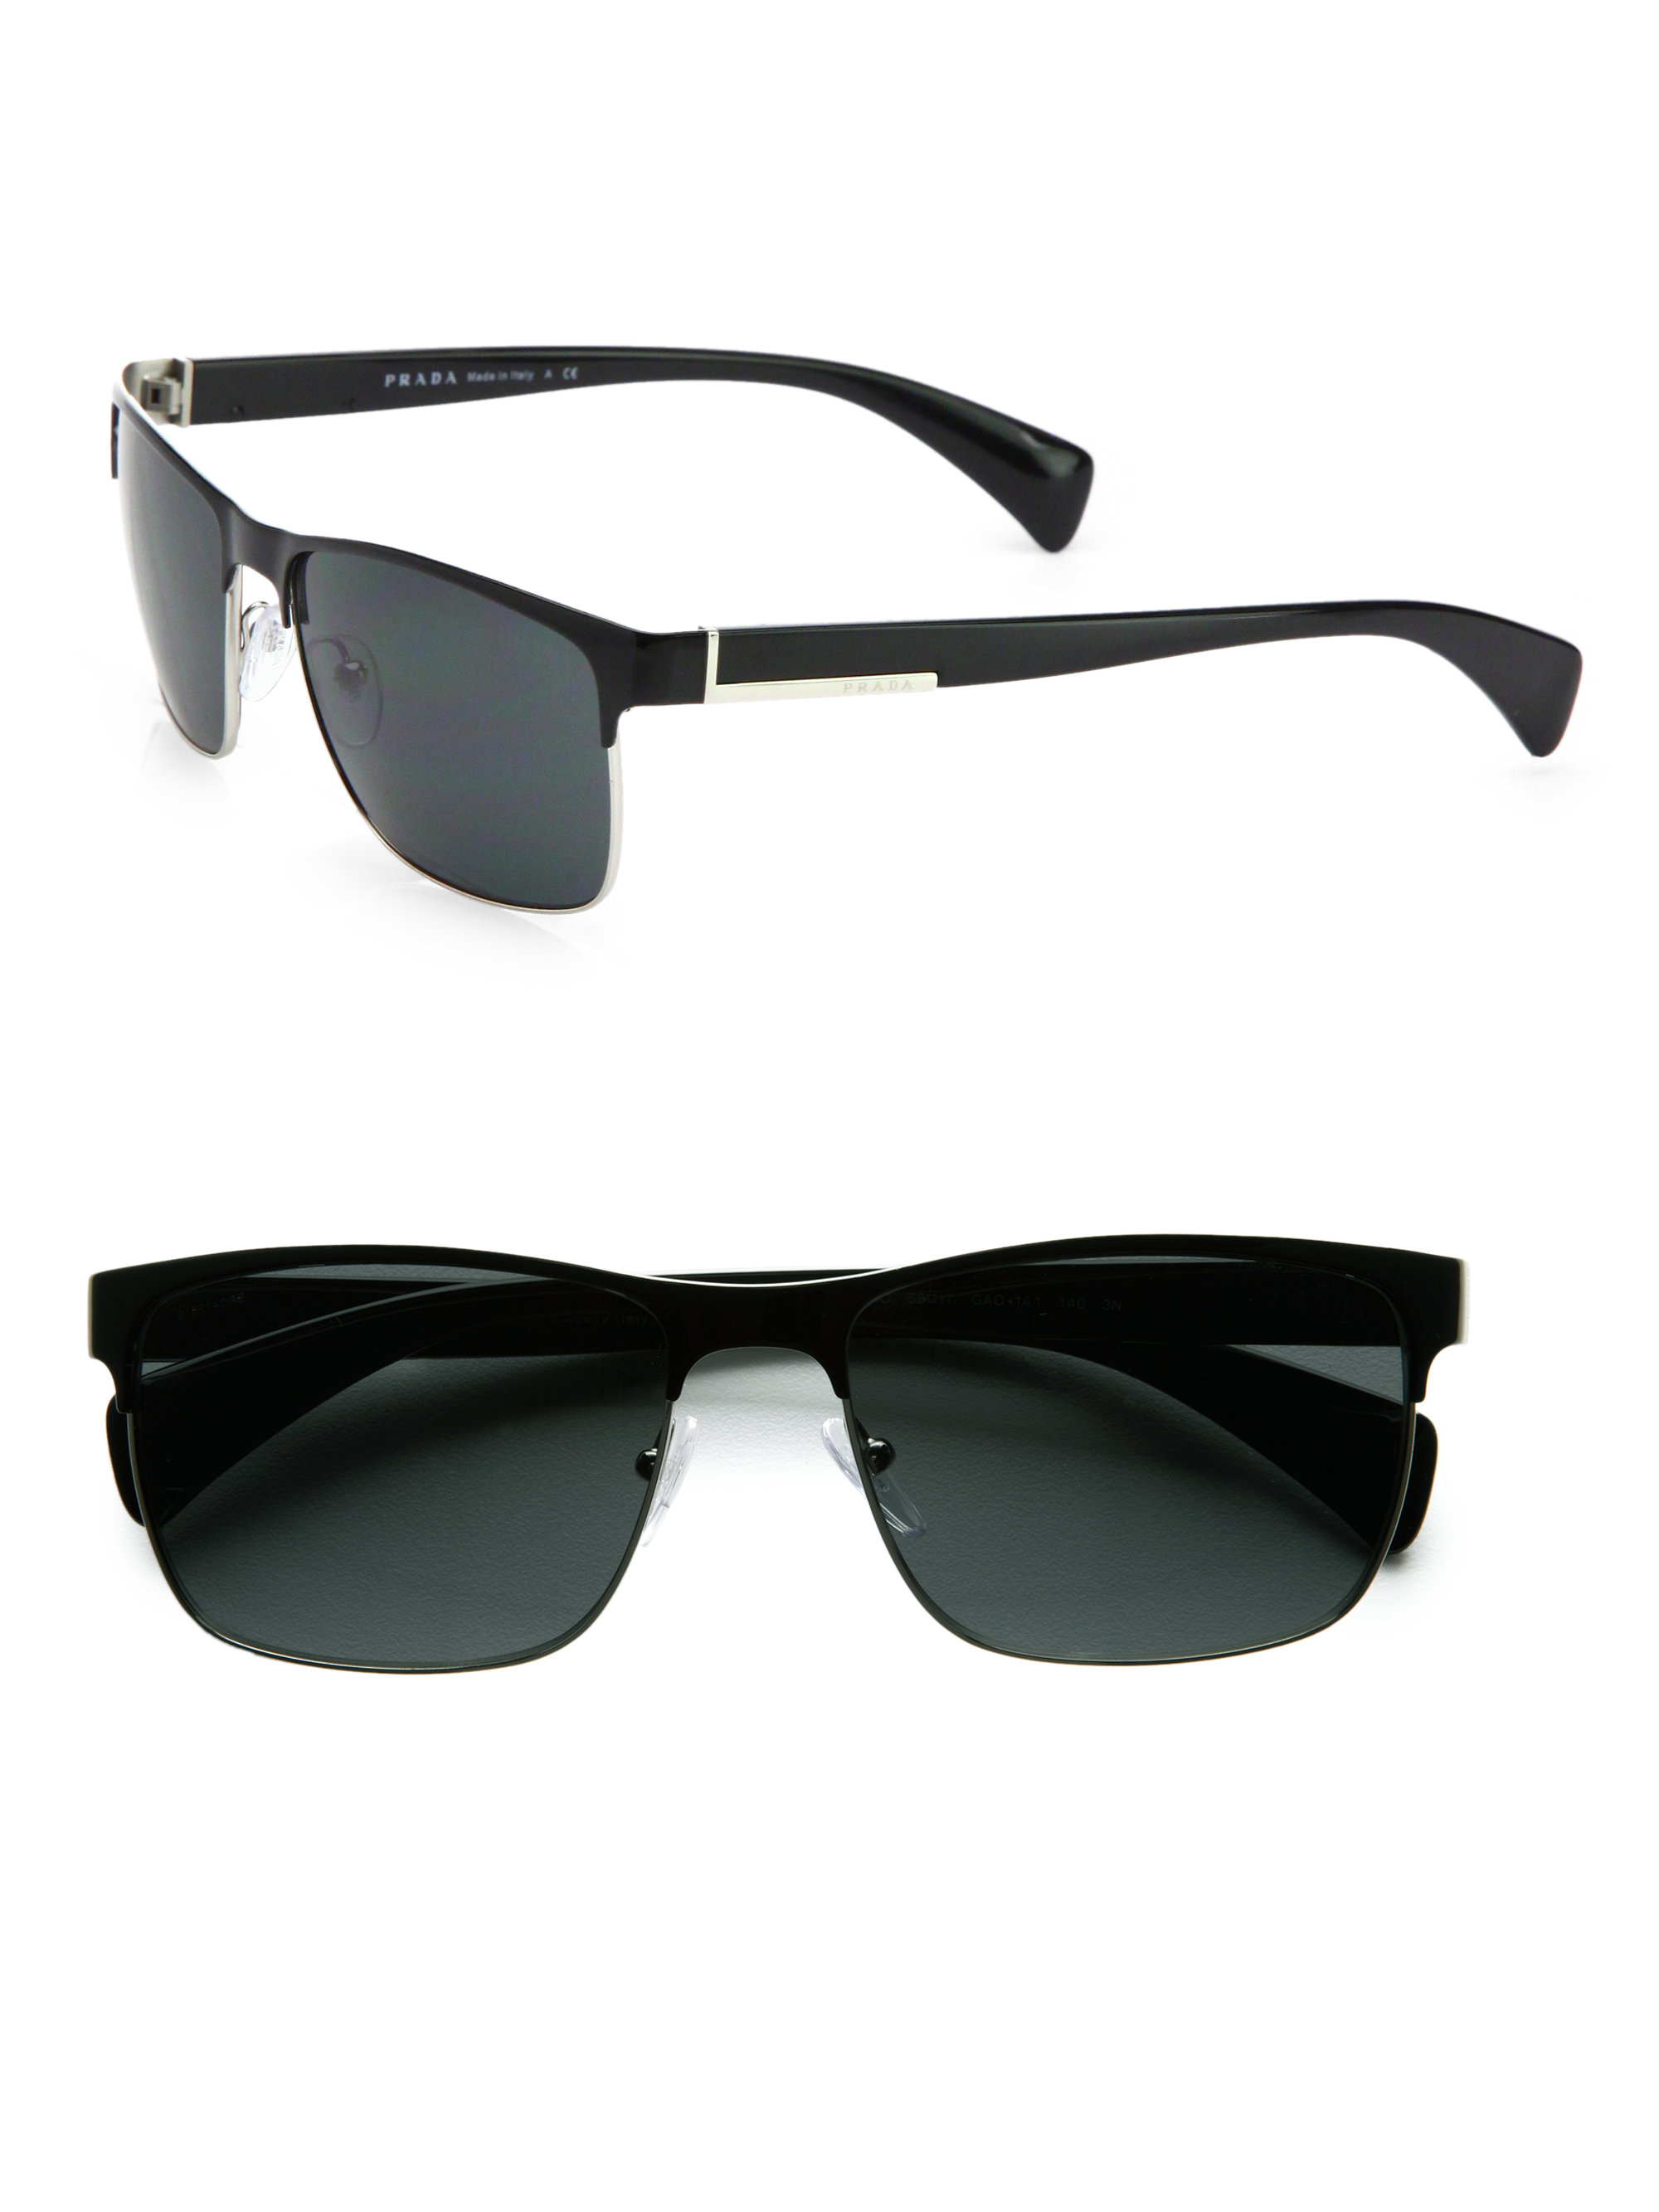 Lyst - Prada Twotone Square Sunglasses in Black for Men